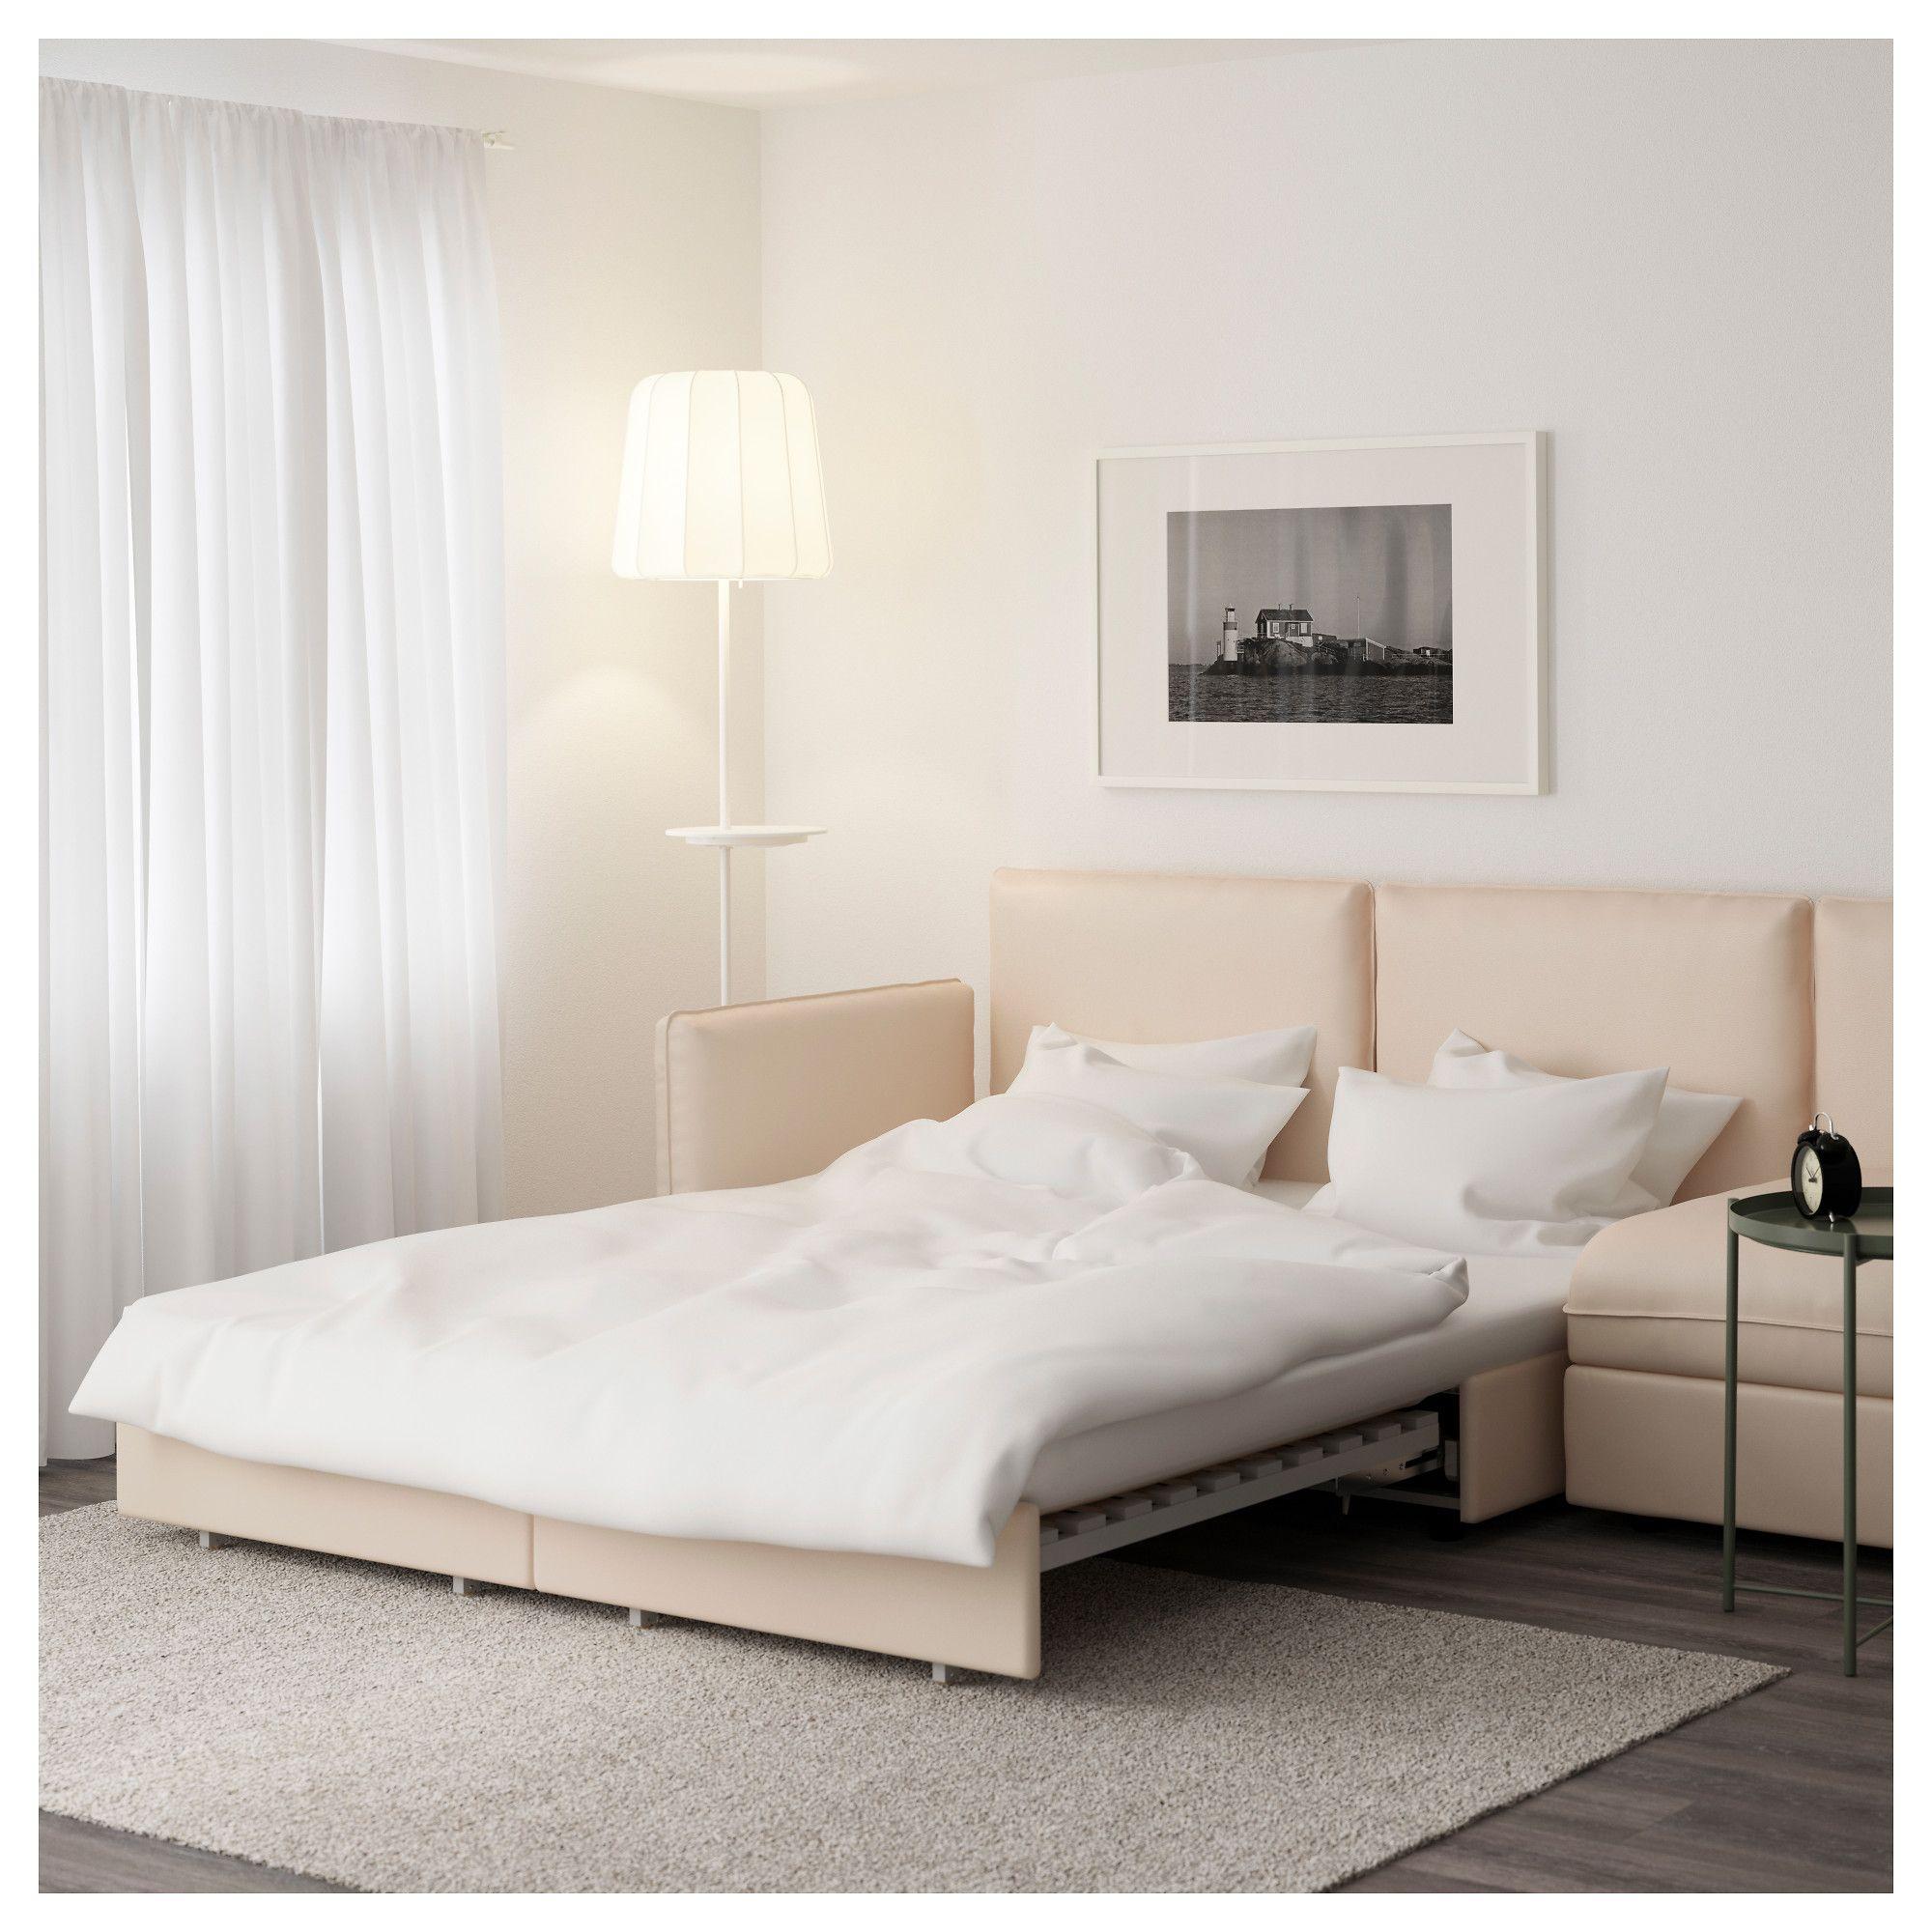 Furniture Home Furnishings Find Your Inspiration Ikea Sofa Bed Sofa Bed Snug Room